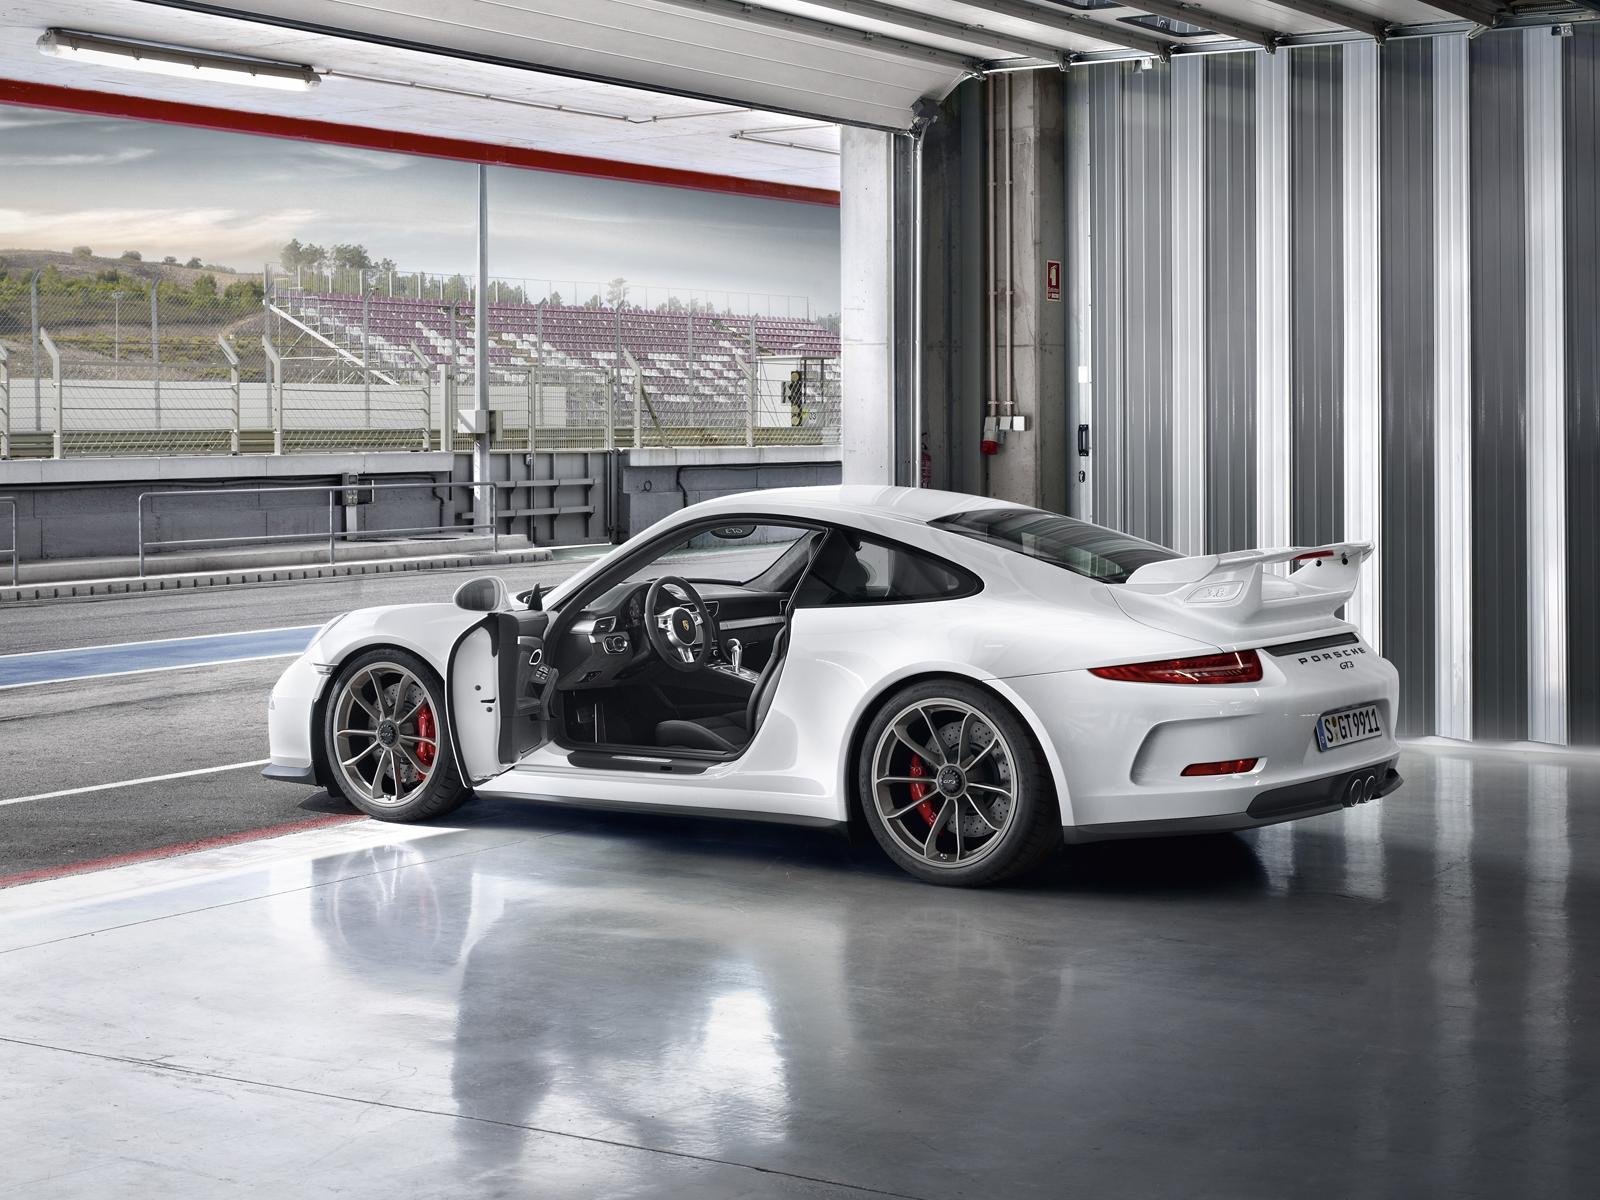 2014 porsche 911 gt3 991 supercar interior f wallpaper 1600x1200 230911 wallpaperup